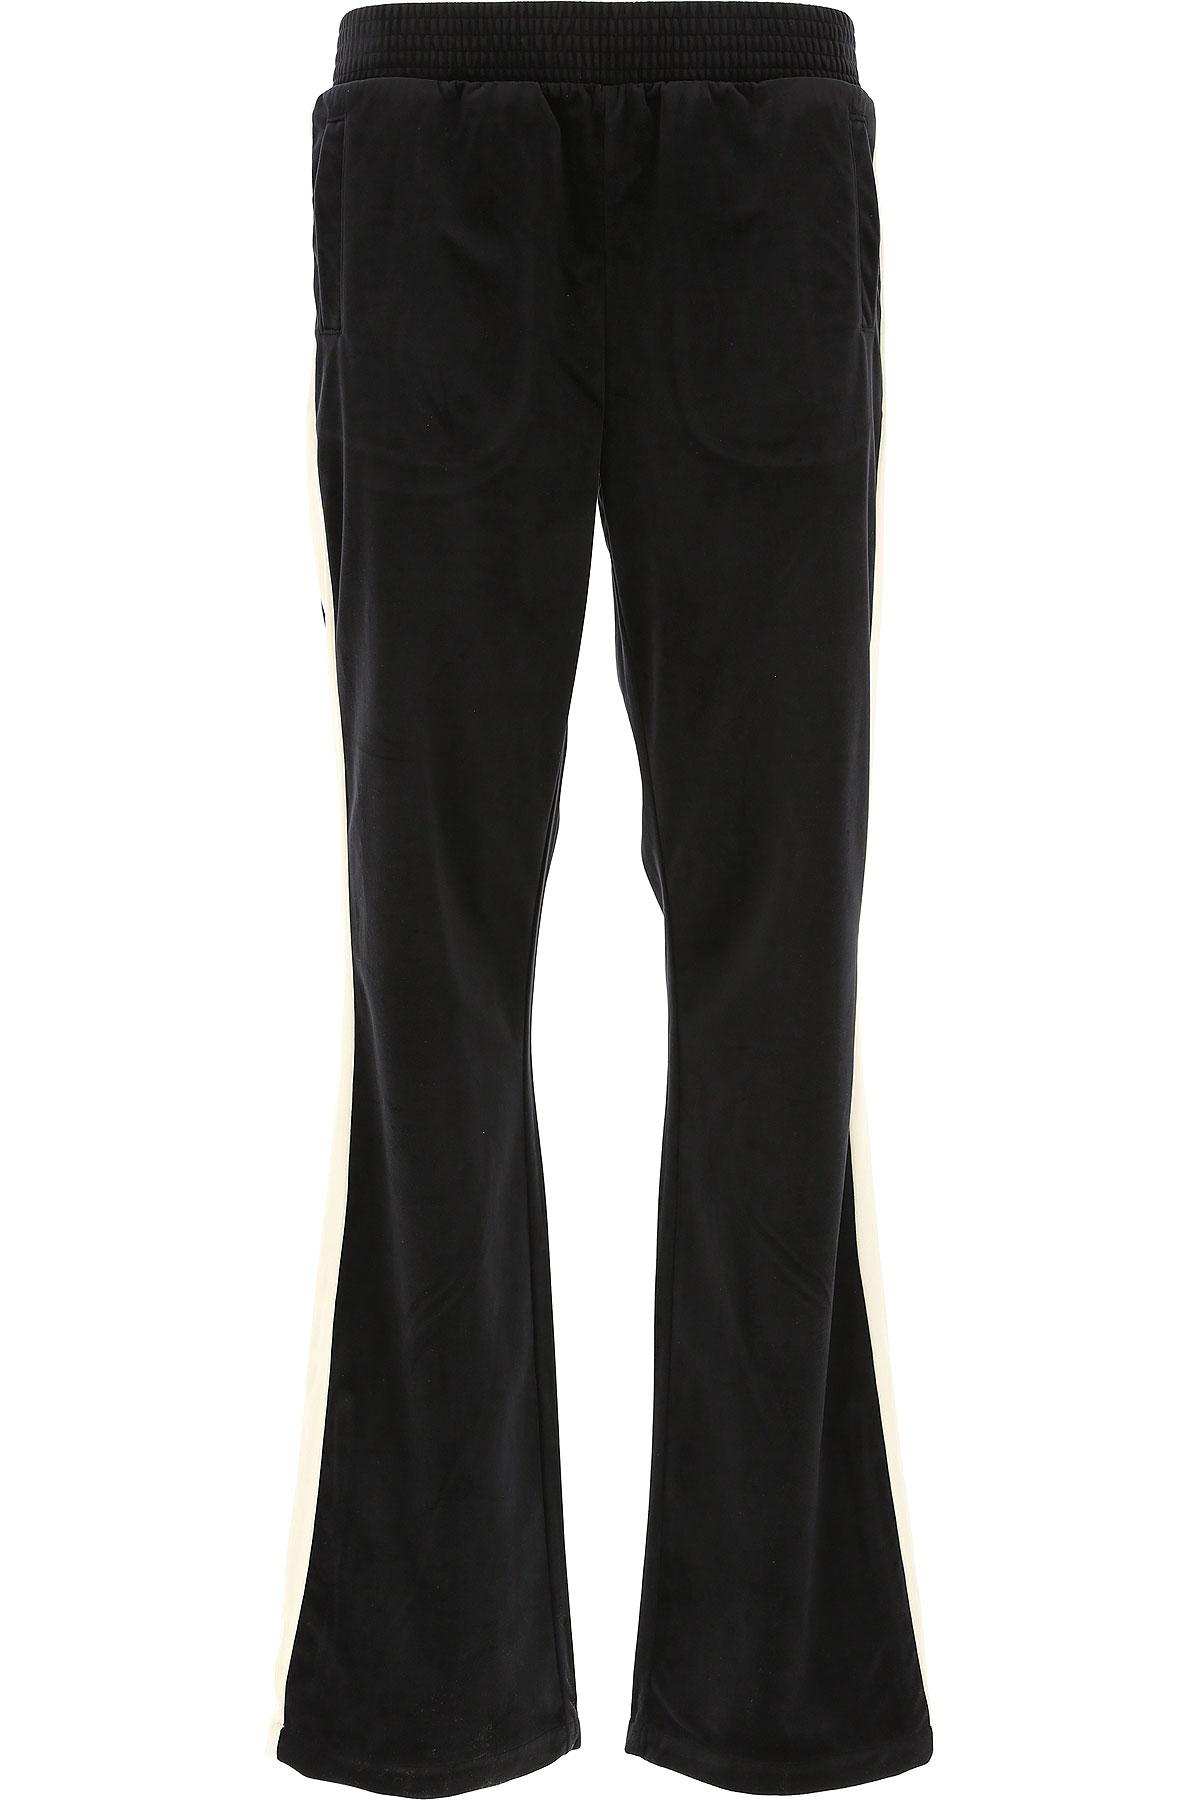 Image of Emporio Armani Sweatpants, Black, polyester, 2017, 12 24 26 28 30 4 6 8